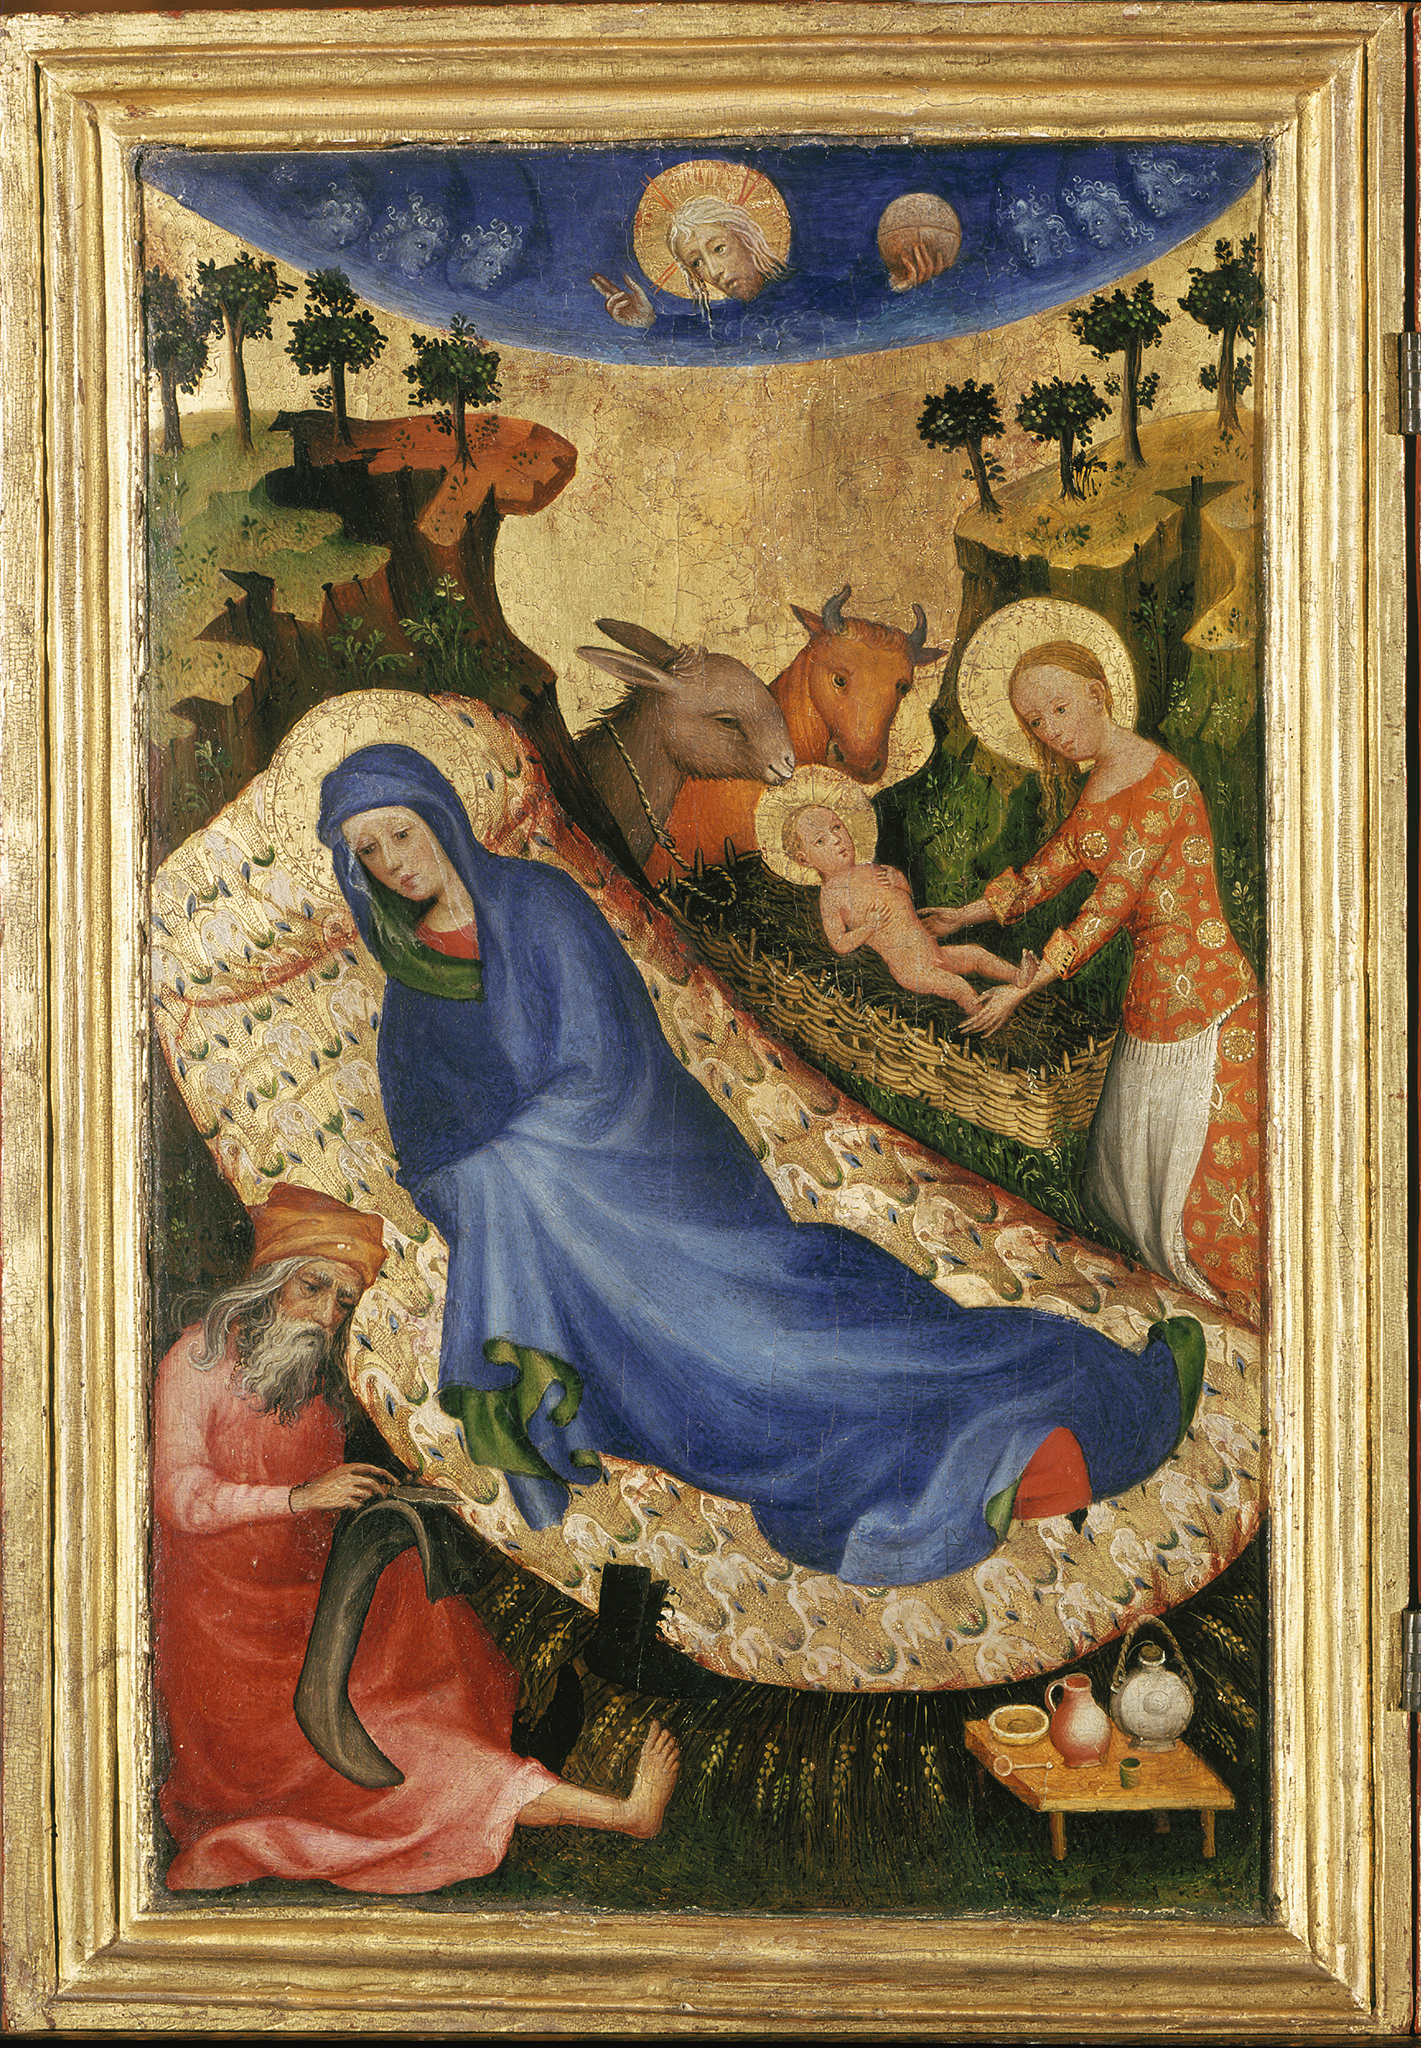 Mosan-Netherlandish-artist-Nativity-panel-of-the-Antwerp-Baltimore-Polyptych-of-Philip-the-Bold-ca.-1400-Antwerp-Mayer-van-den-Bergh-Museum